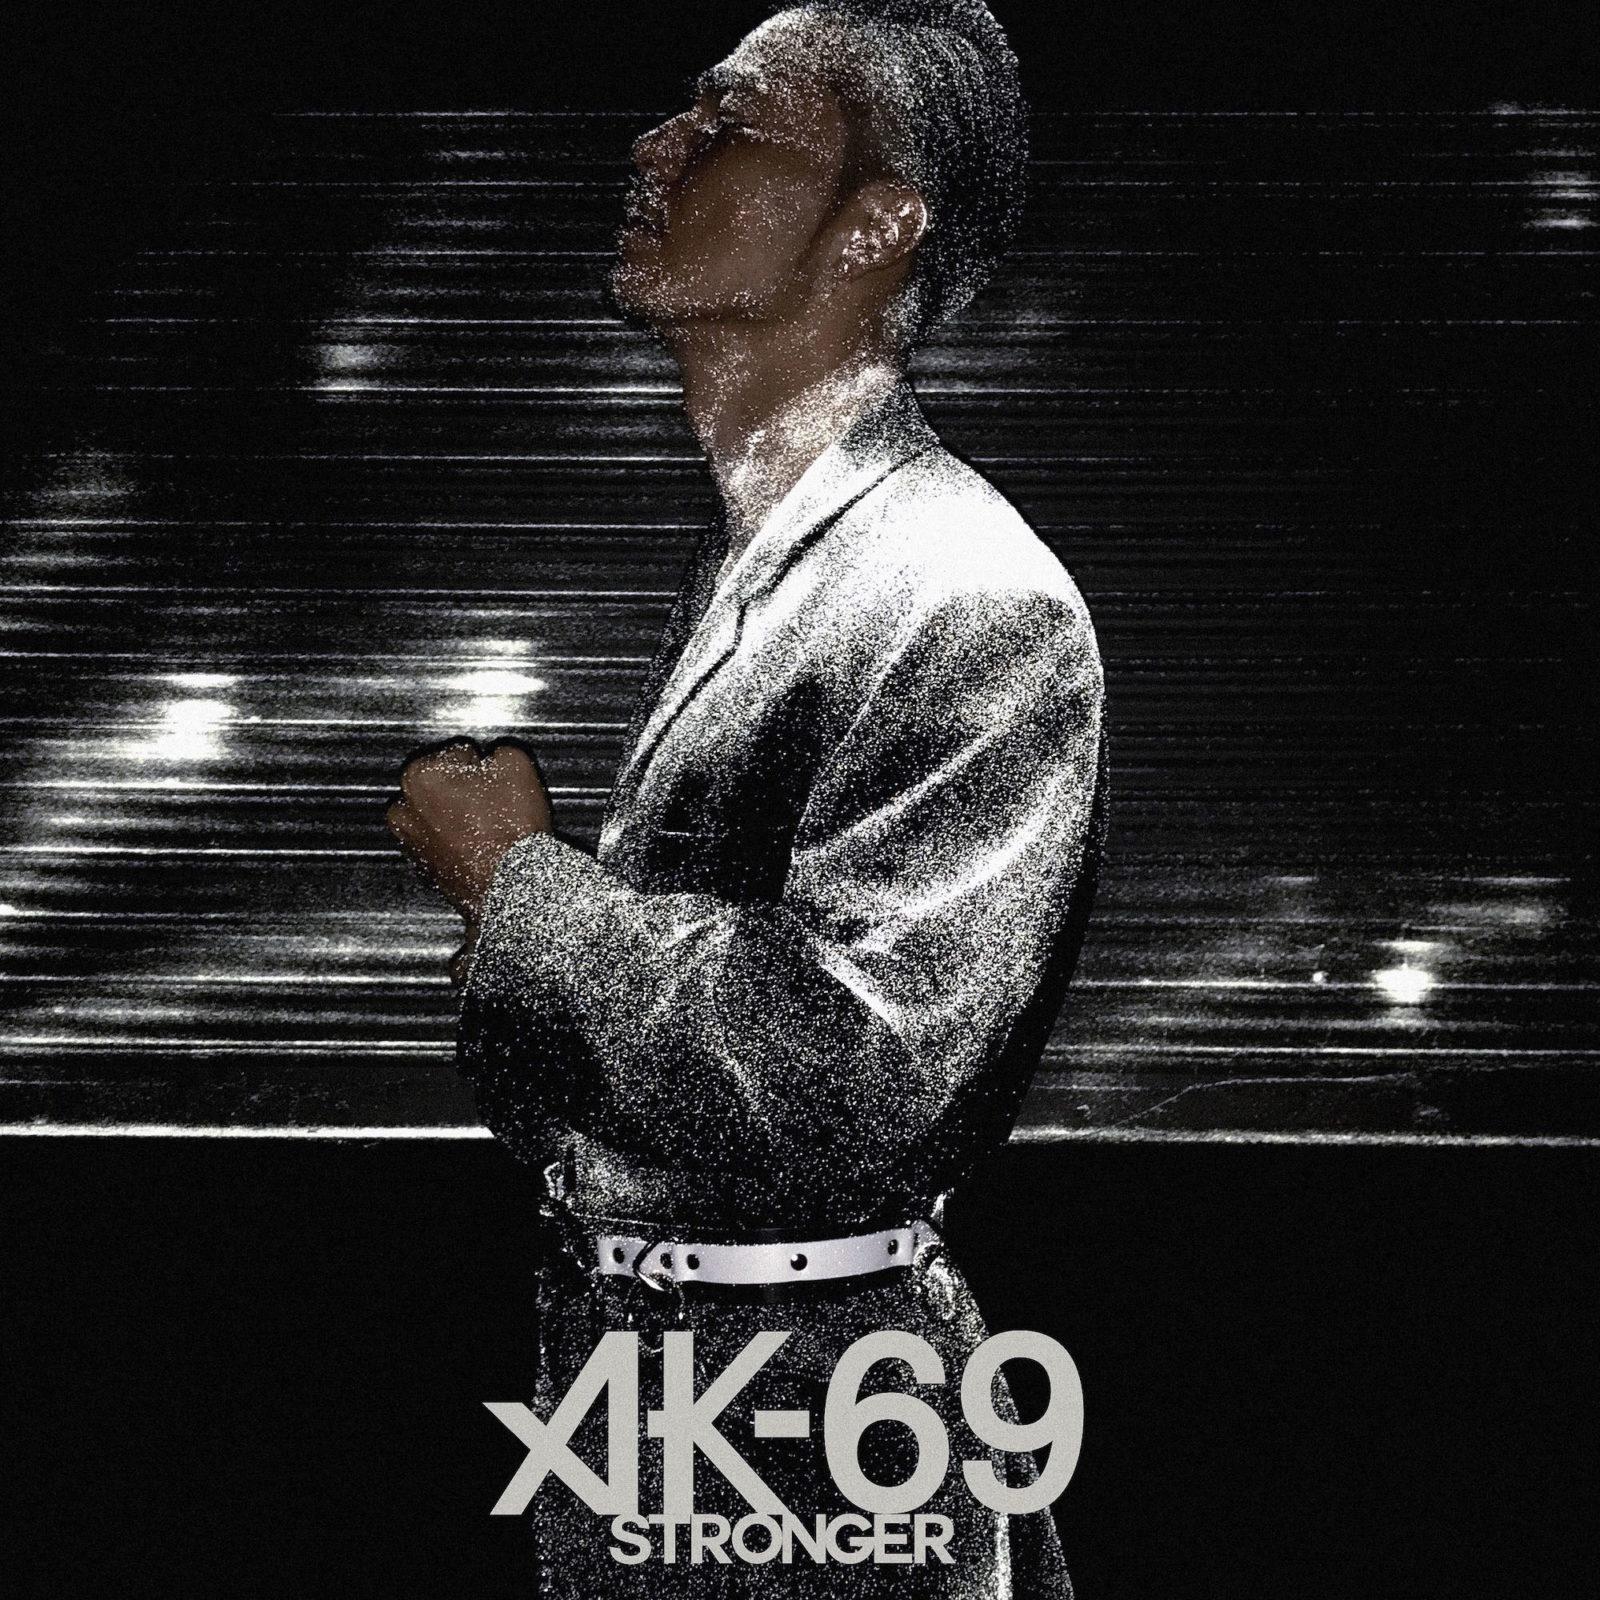 "AK-69、6月9日""AK-69の日""に亡き父に贈る、最大のリスペクトと誓いを込めた新曲「Stronger」を配信、そして同日にUVERworldとの""対バン""ライヴ、赤坂BLITZにて開催決定サムネイル画像"